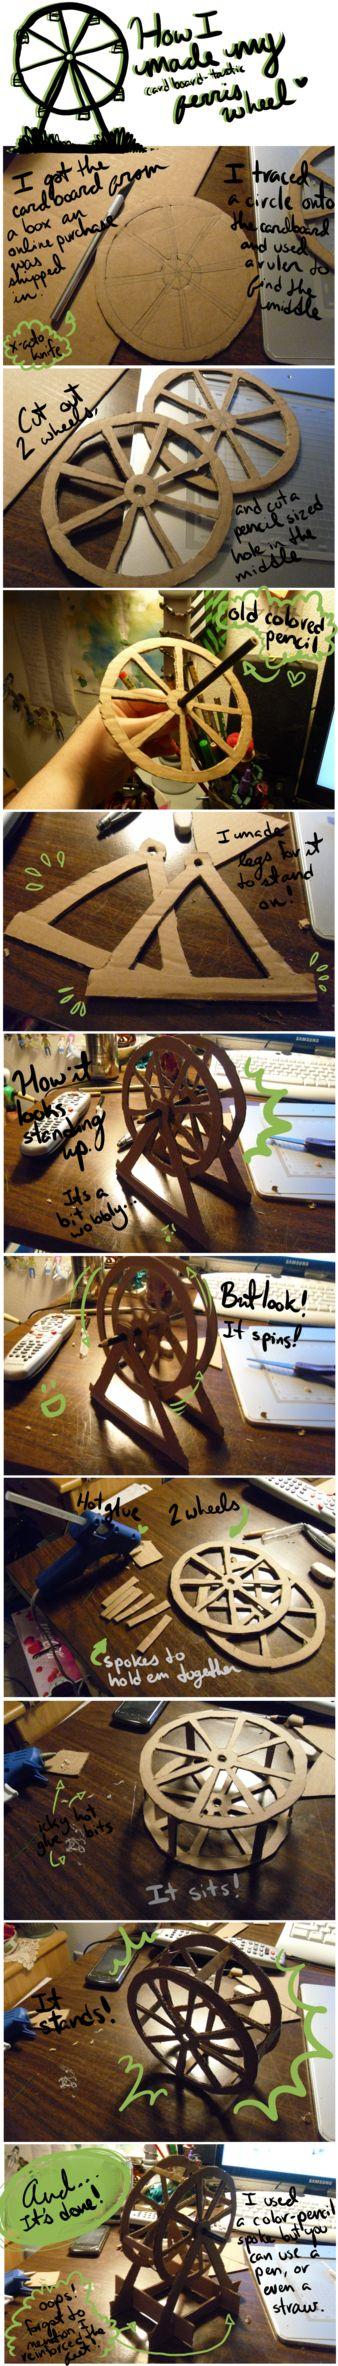 Cardboard Ferris Wheel by ~CrimsonPearls on deviantART